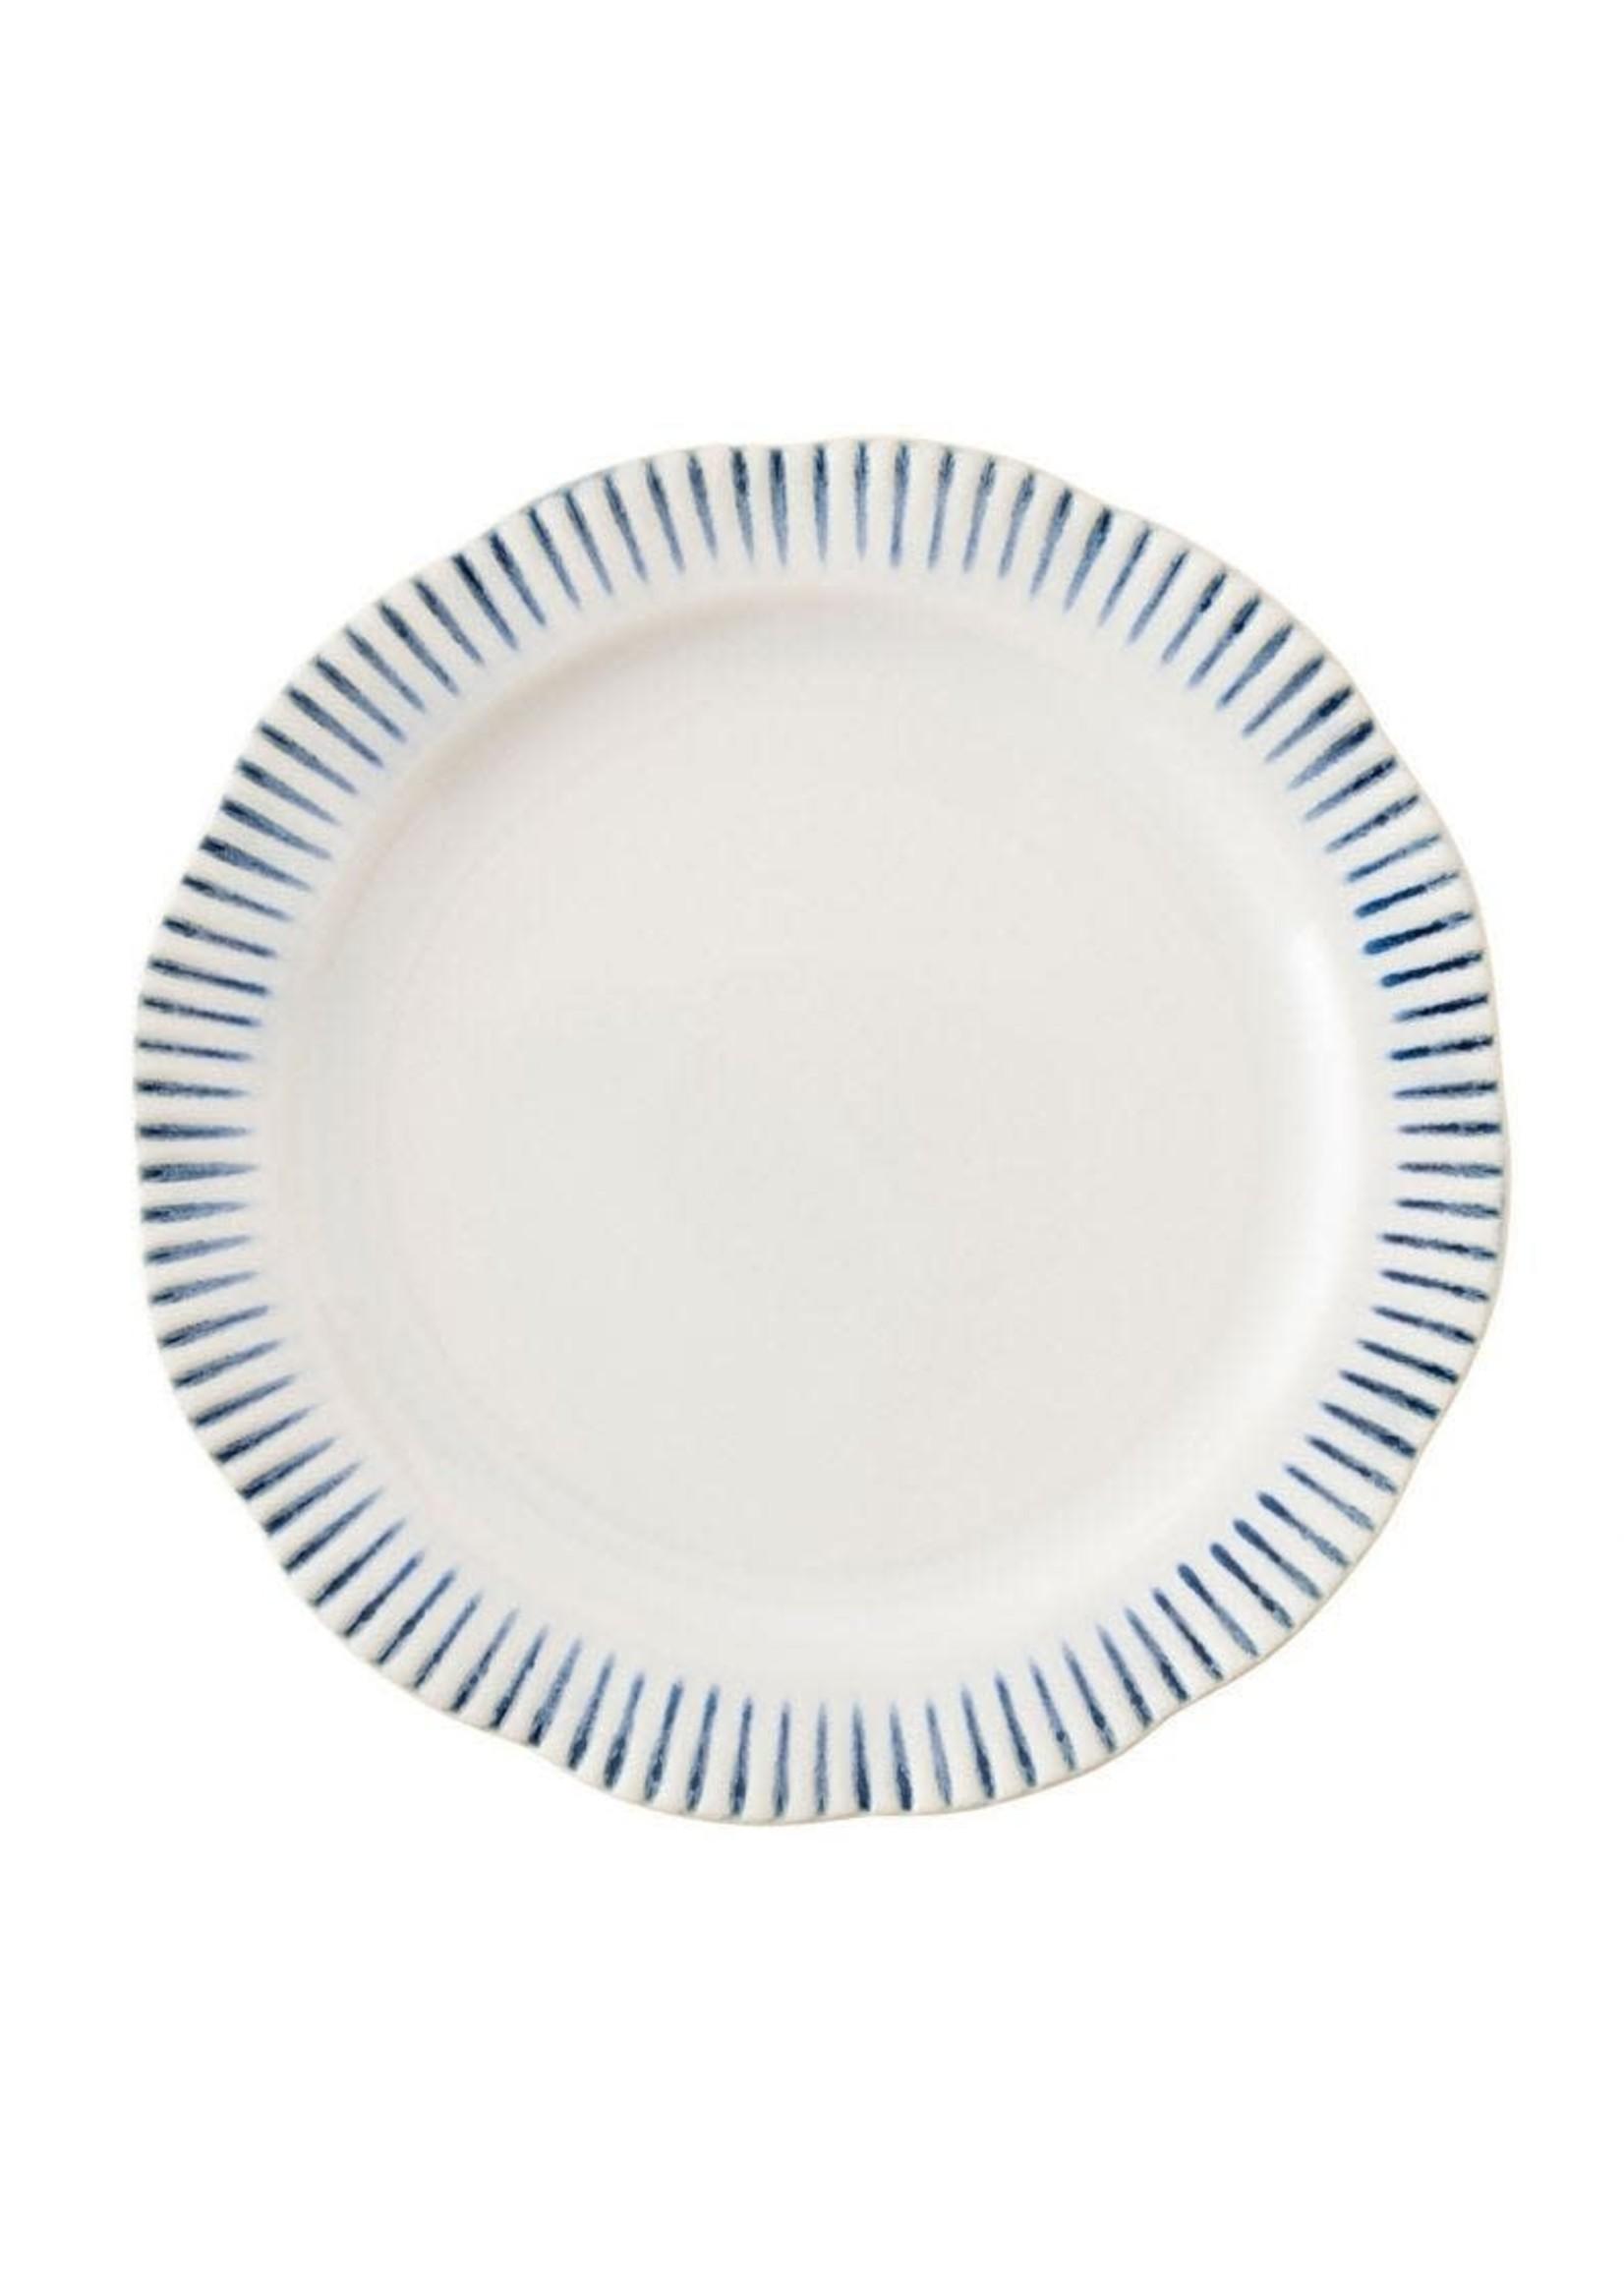 Juliska Sitio Stripe Indigo - Dinner Plate